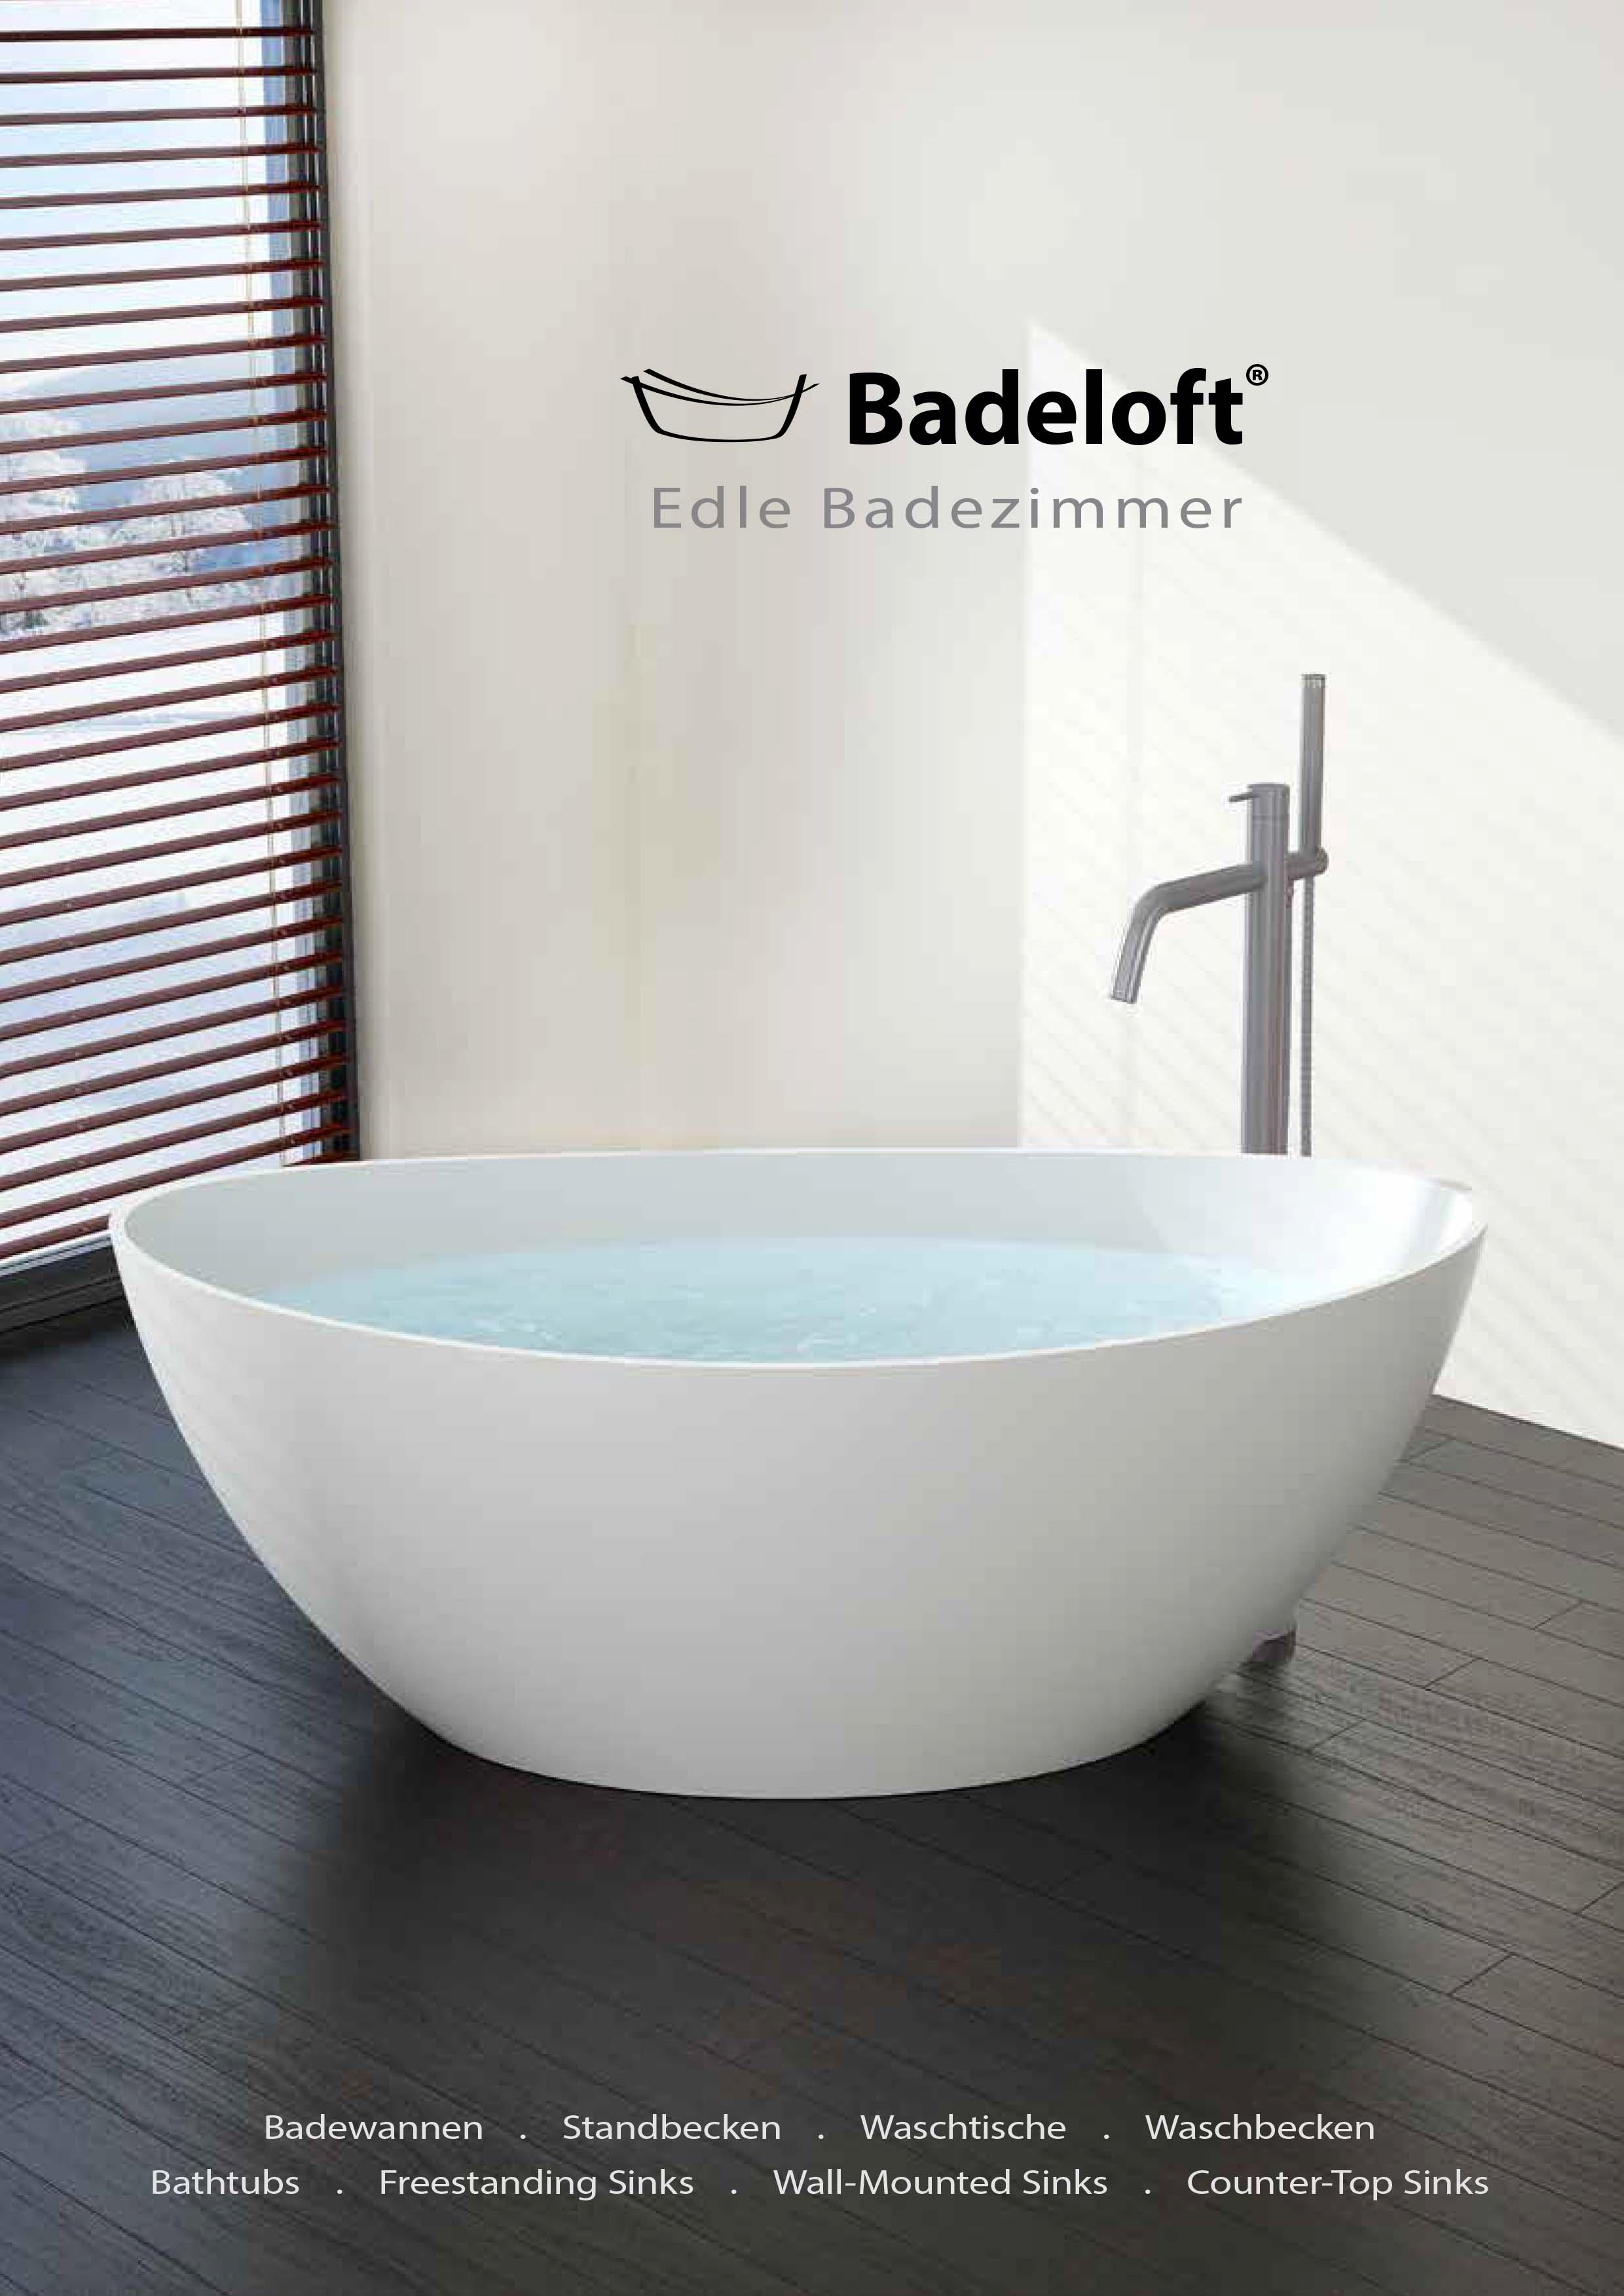 Badeloft GmbH